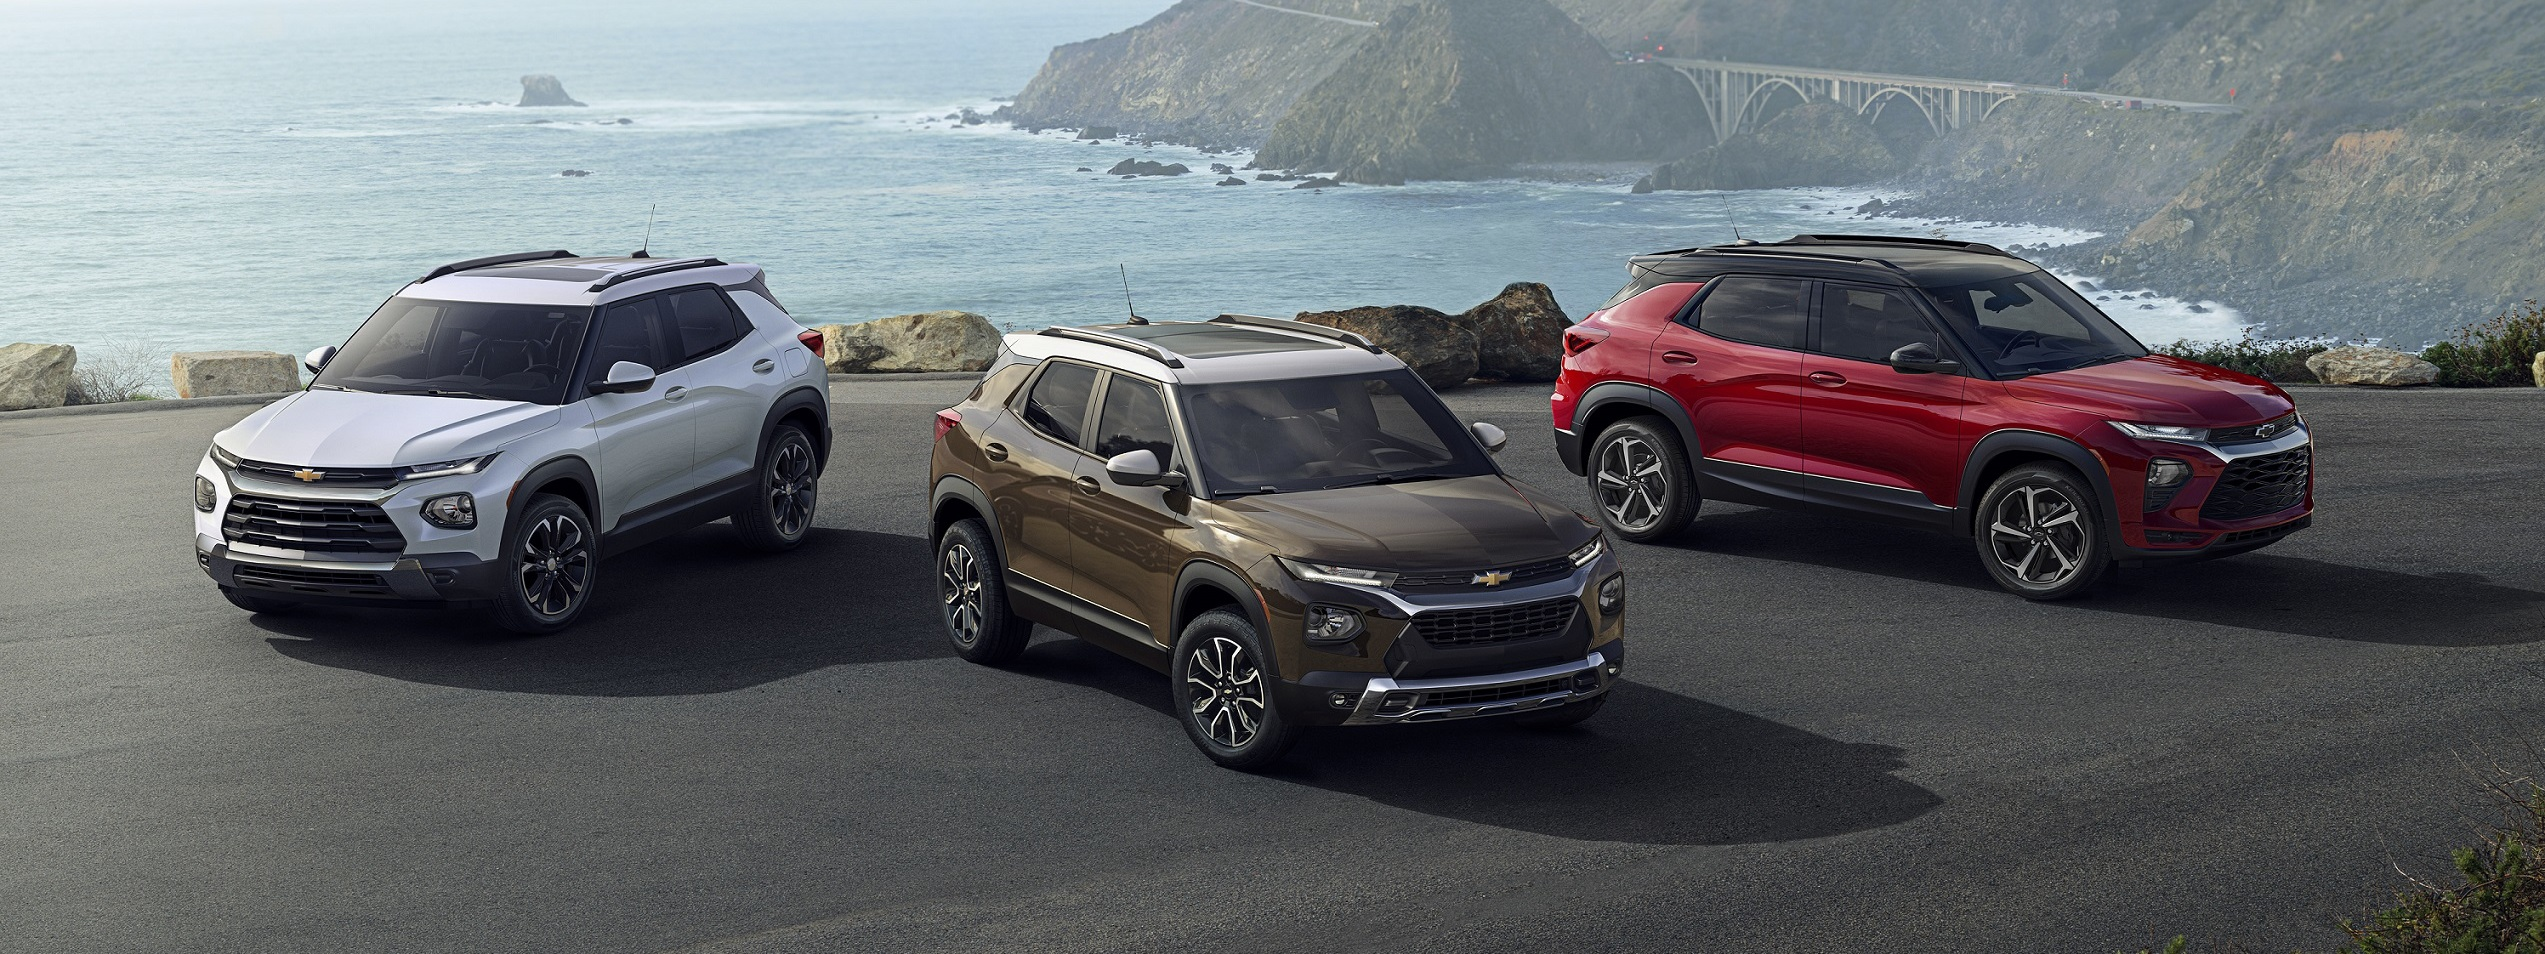 2021 Chevrolet Trailblazer First Look near San Diego, CA